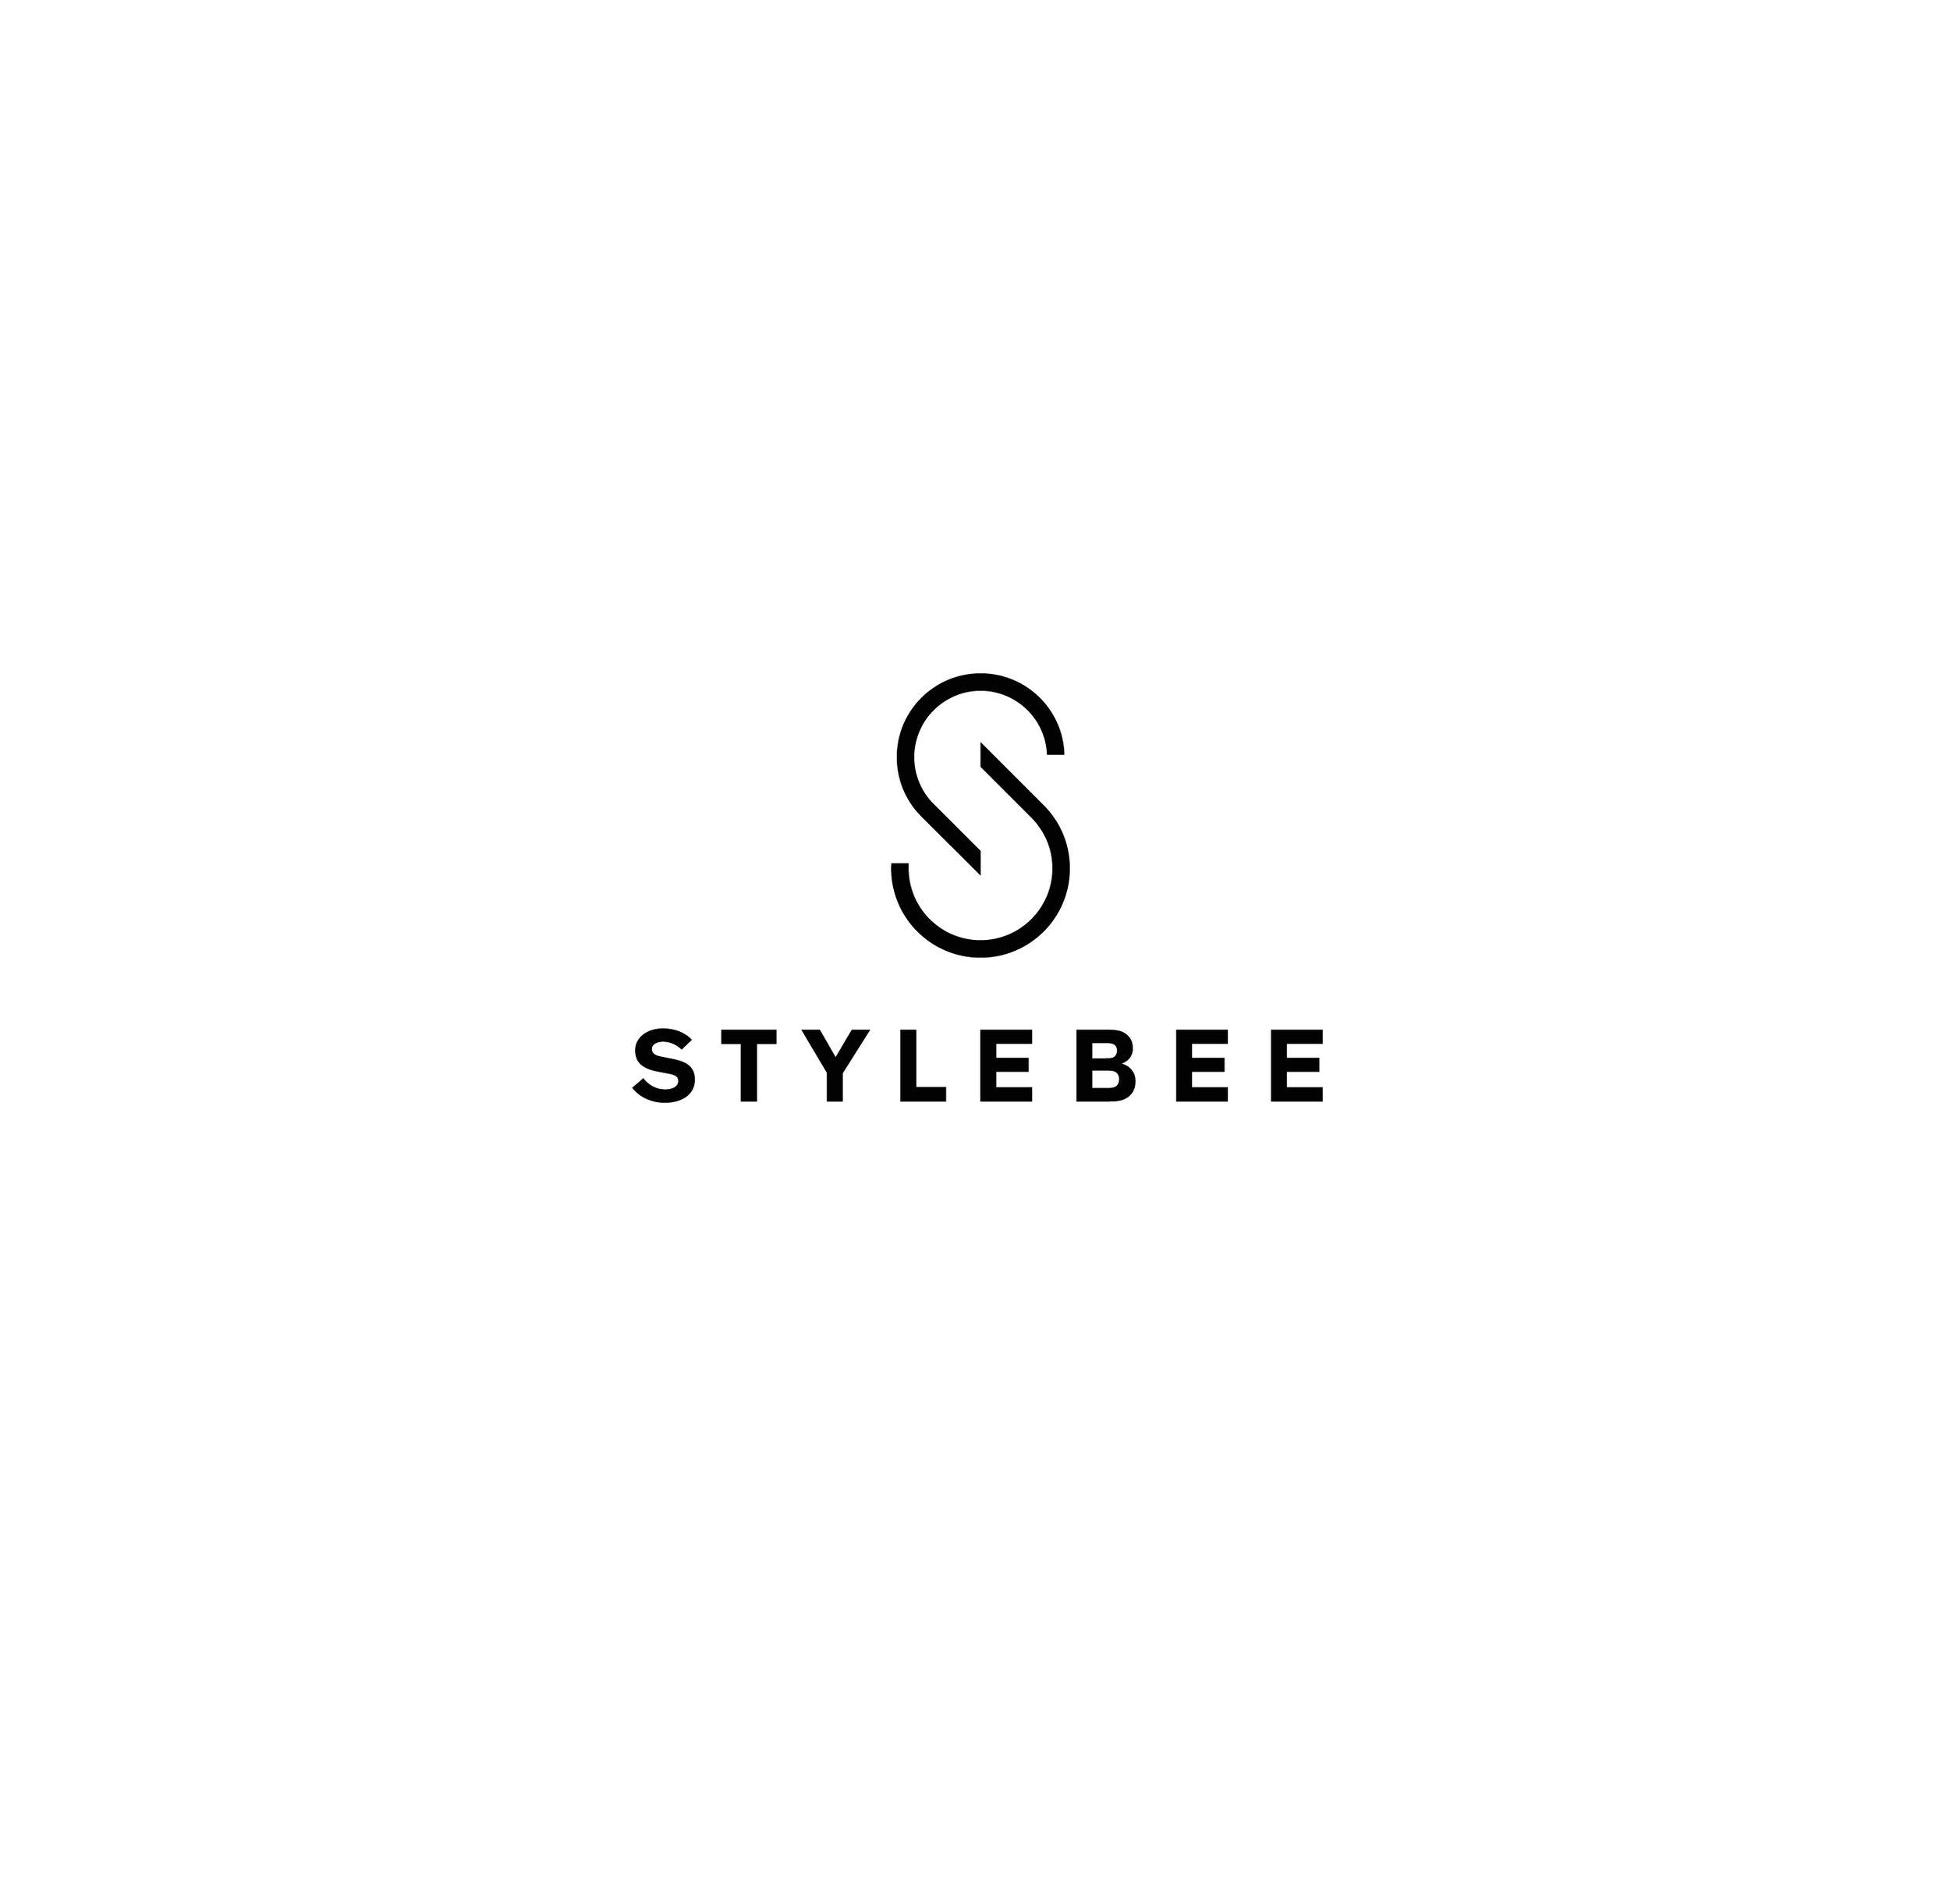 20181121_Penny_Lorber_StyleBee_PL_1-12.jpg